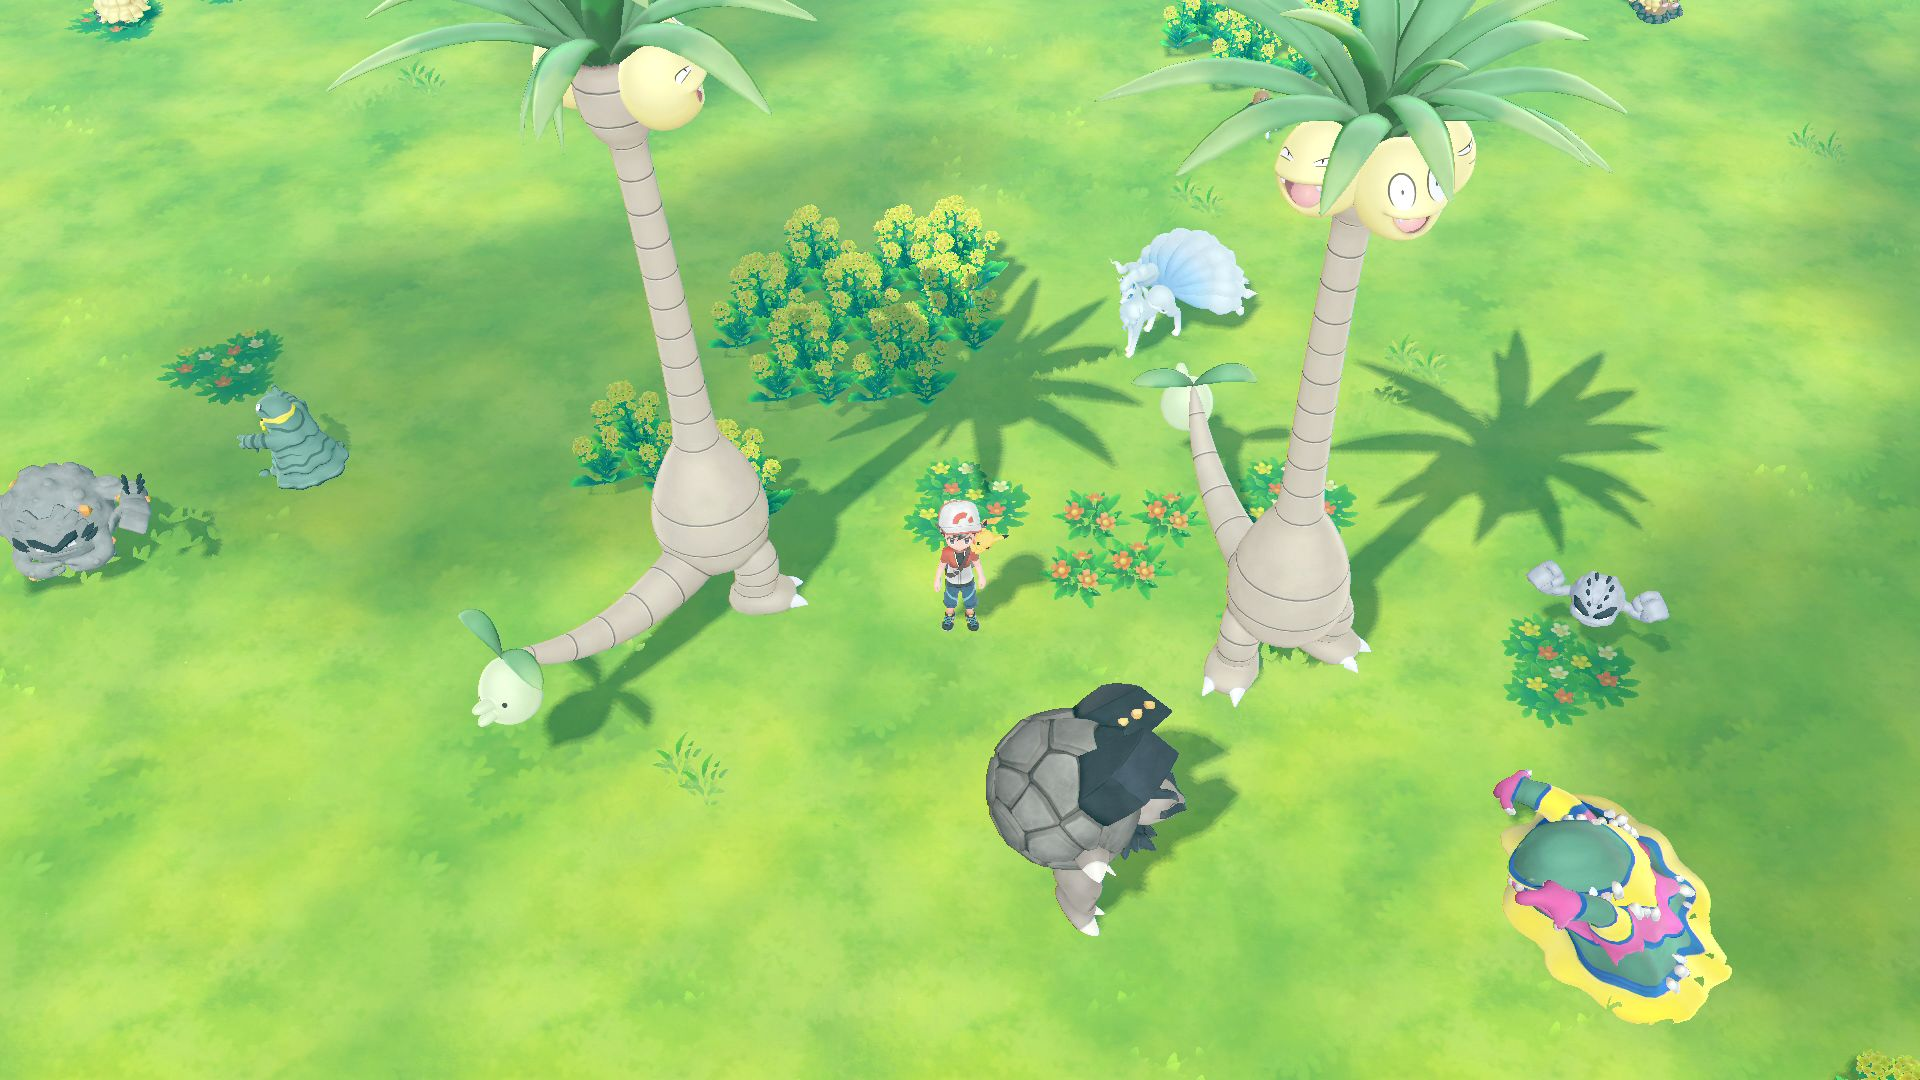 Pokemon Let S Go Pikachu And Eevee Image 7